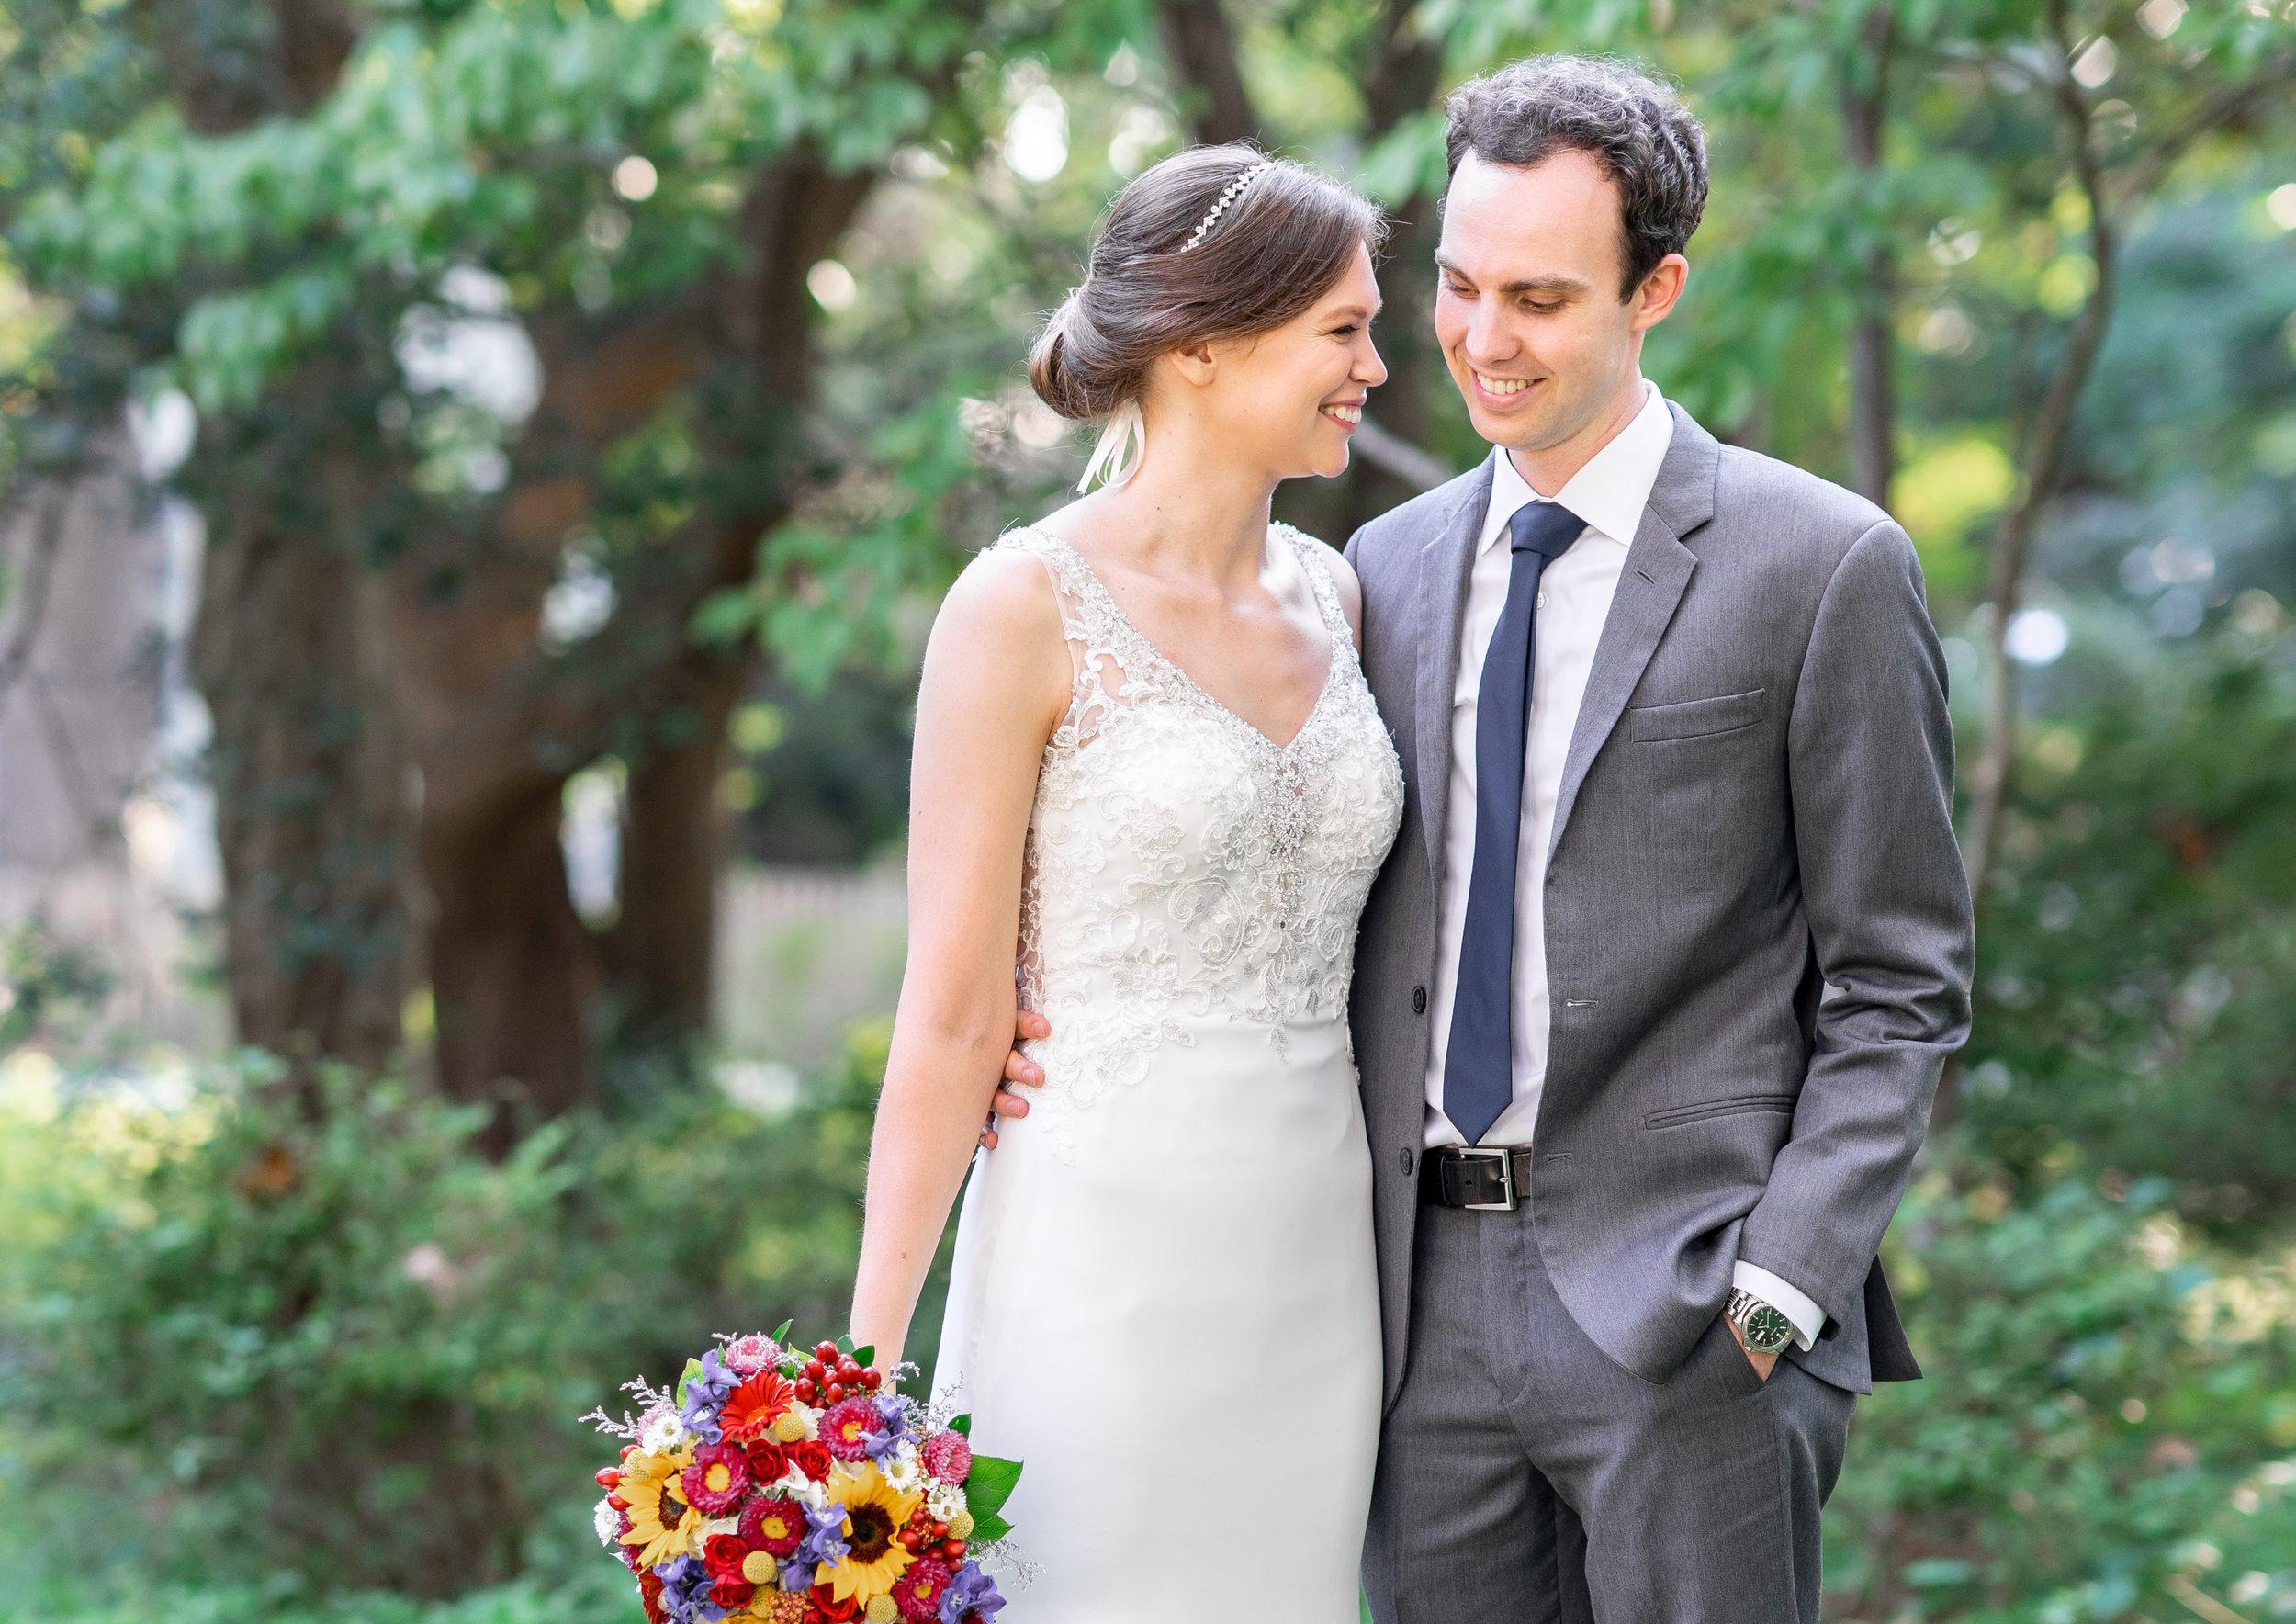 Morilee Myka gown on bride and groom at Elkridge Furnace Inn wedding photos